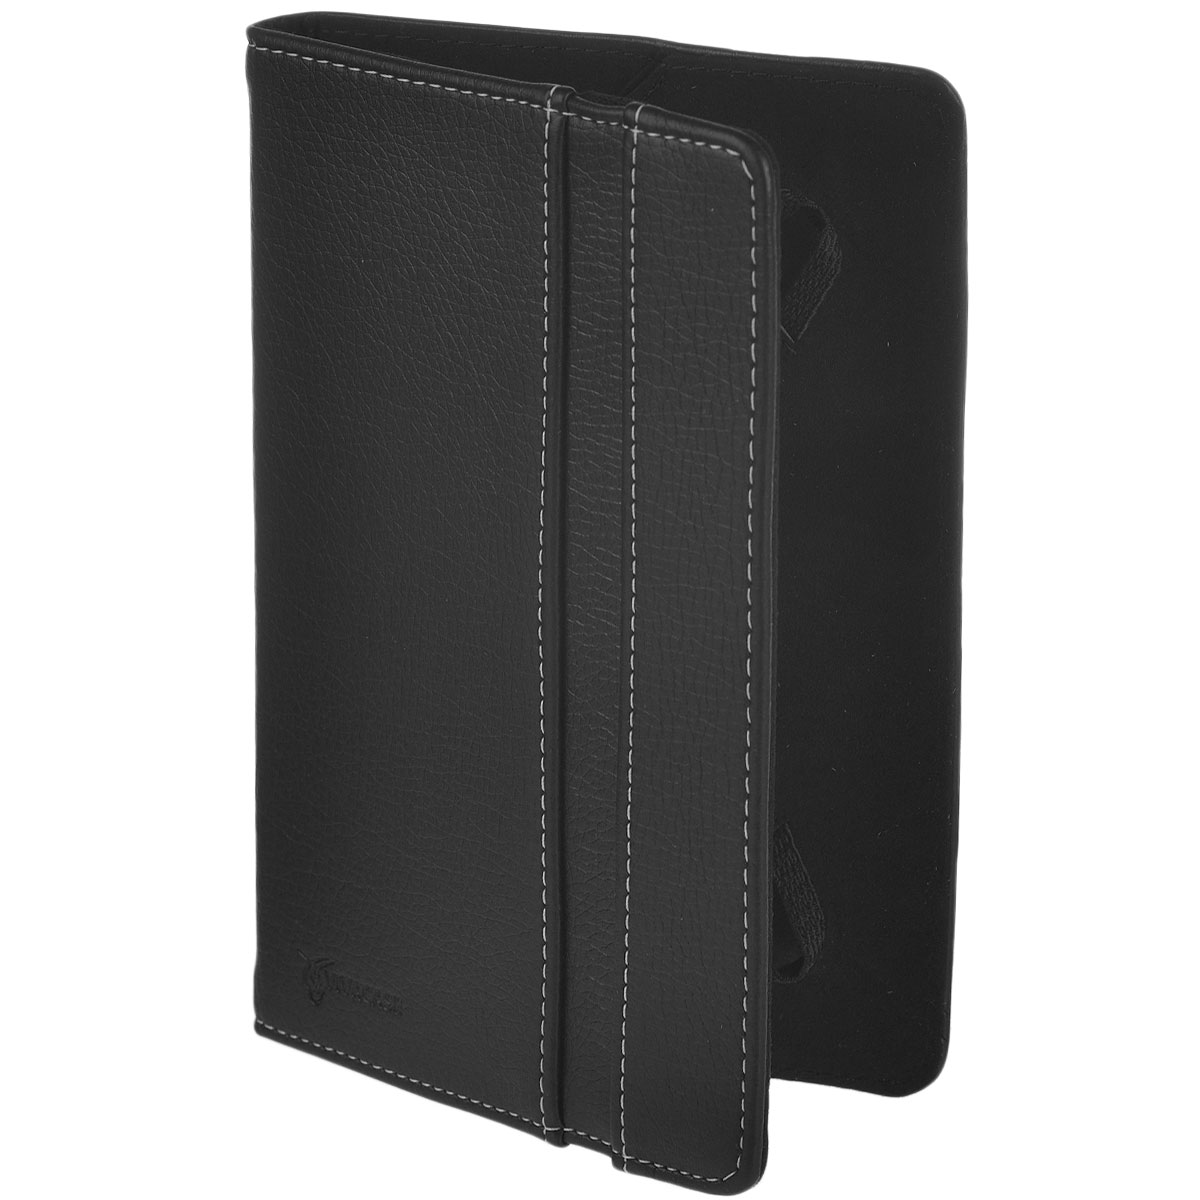 Vivacase Gent чехол для планшетов 7, Black (VUC-CGN07-bl)